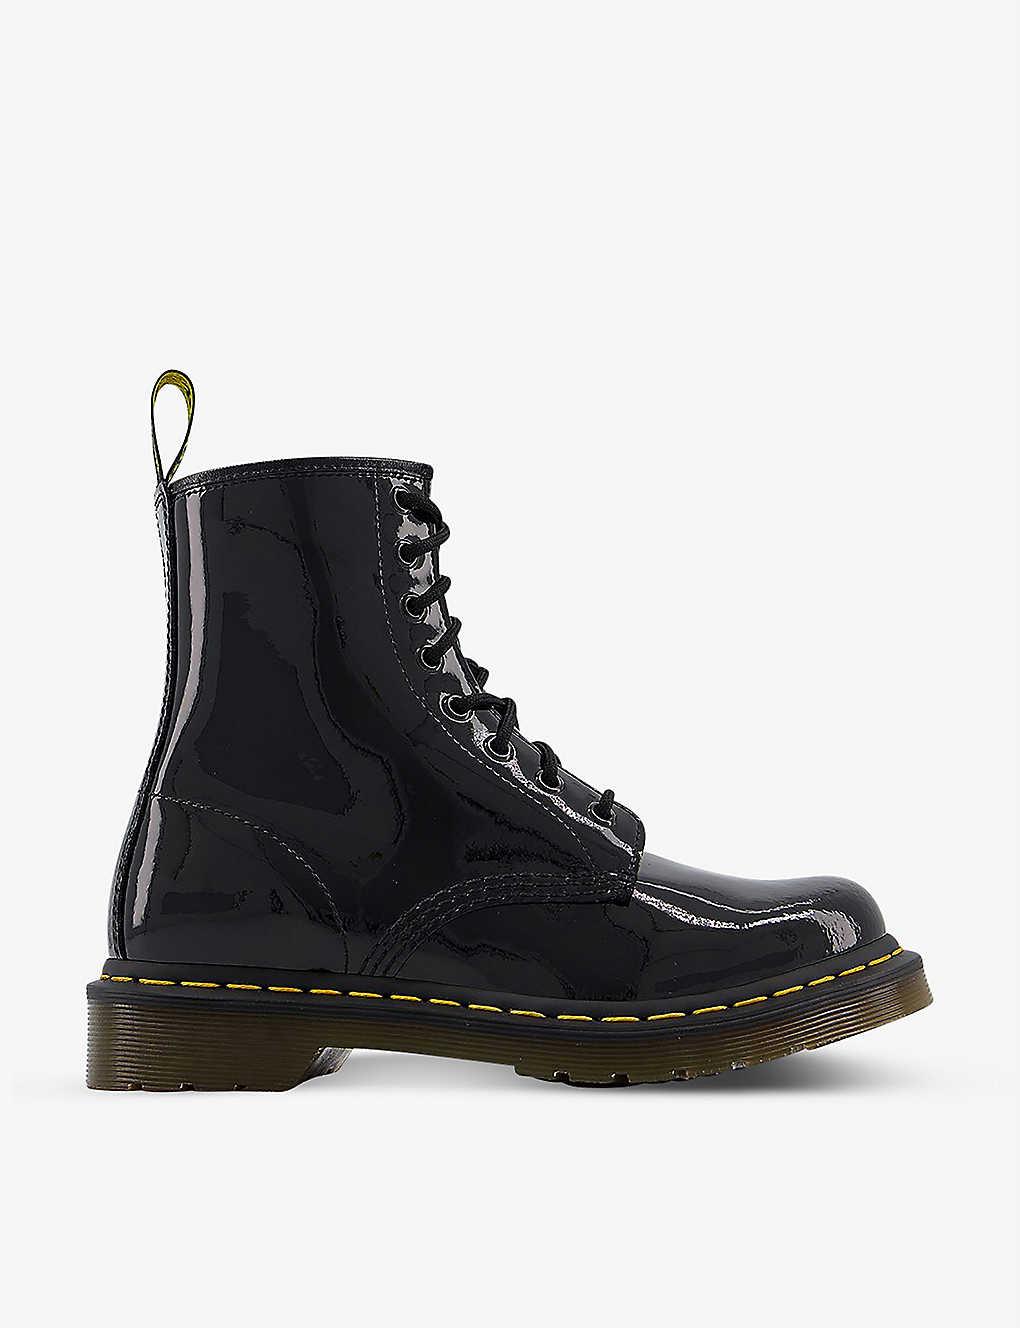 50f0ce4338 DR. MARTENS - 1460 8-eye patent leather boots | Selfridges.com